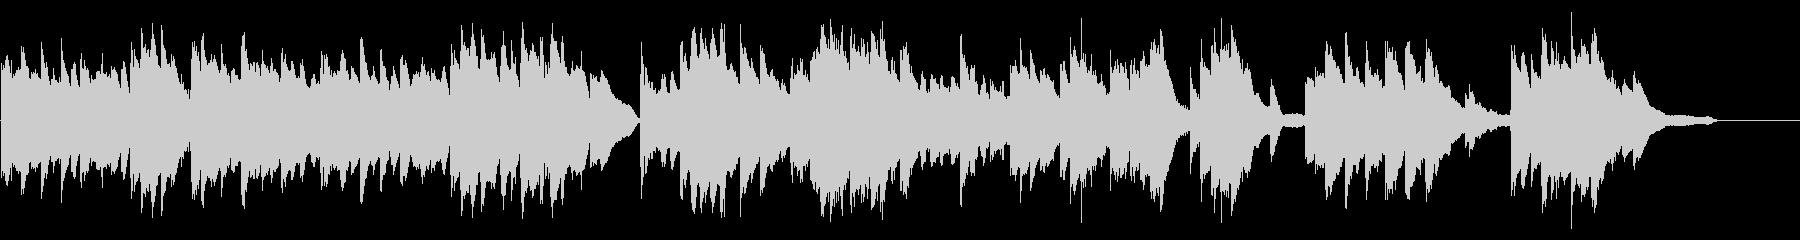 SNS広告 ピアノメイン 懐かしいの未再生の波形